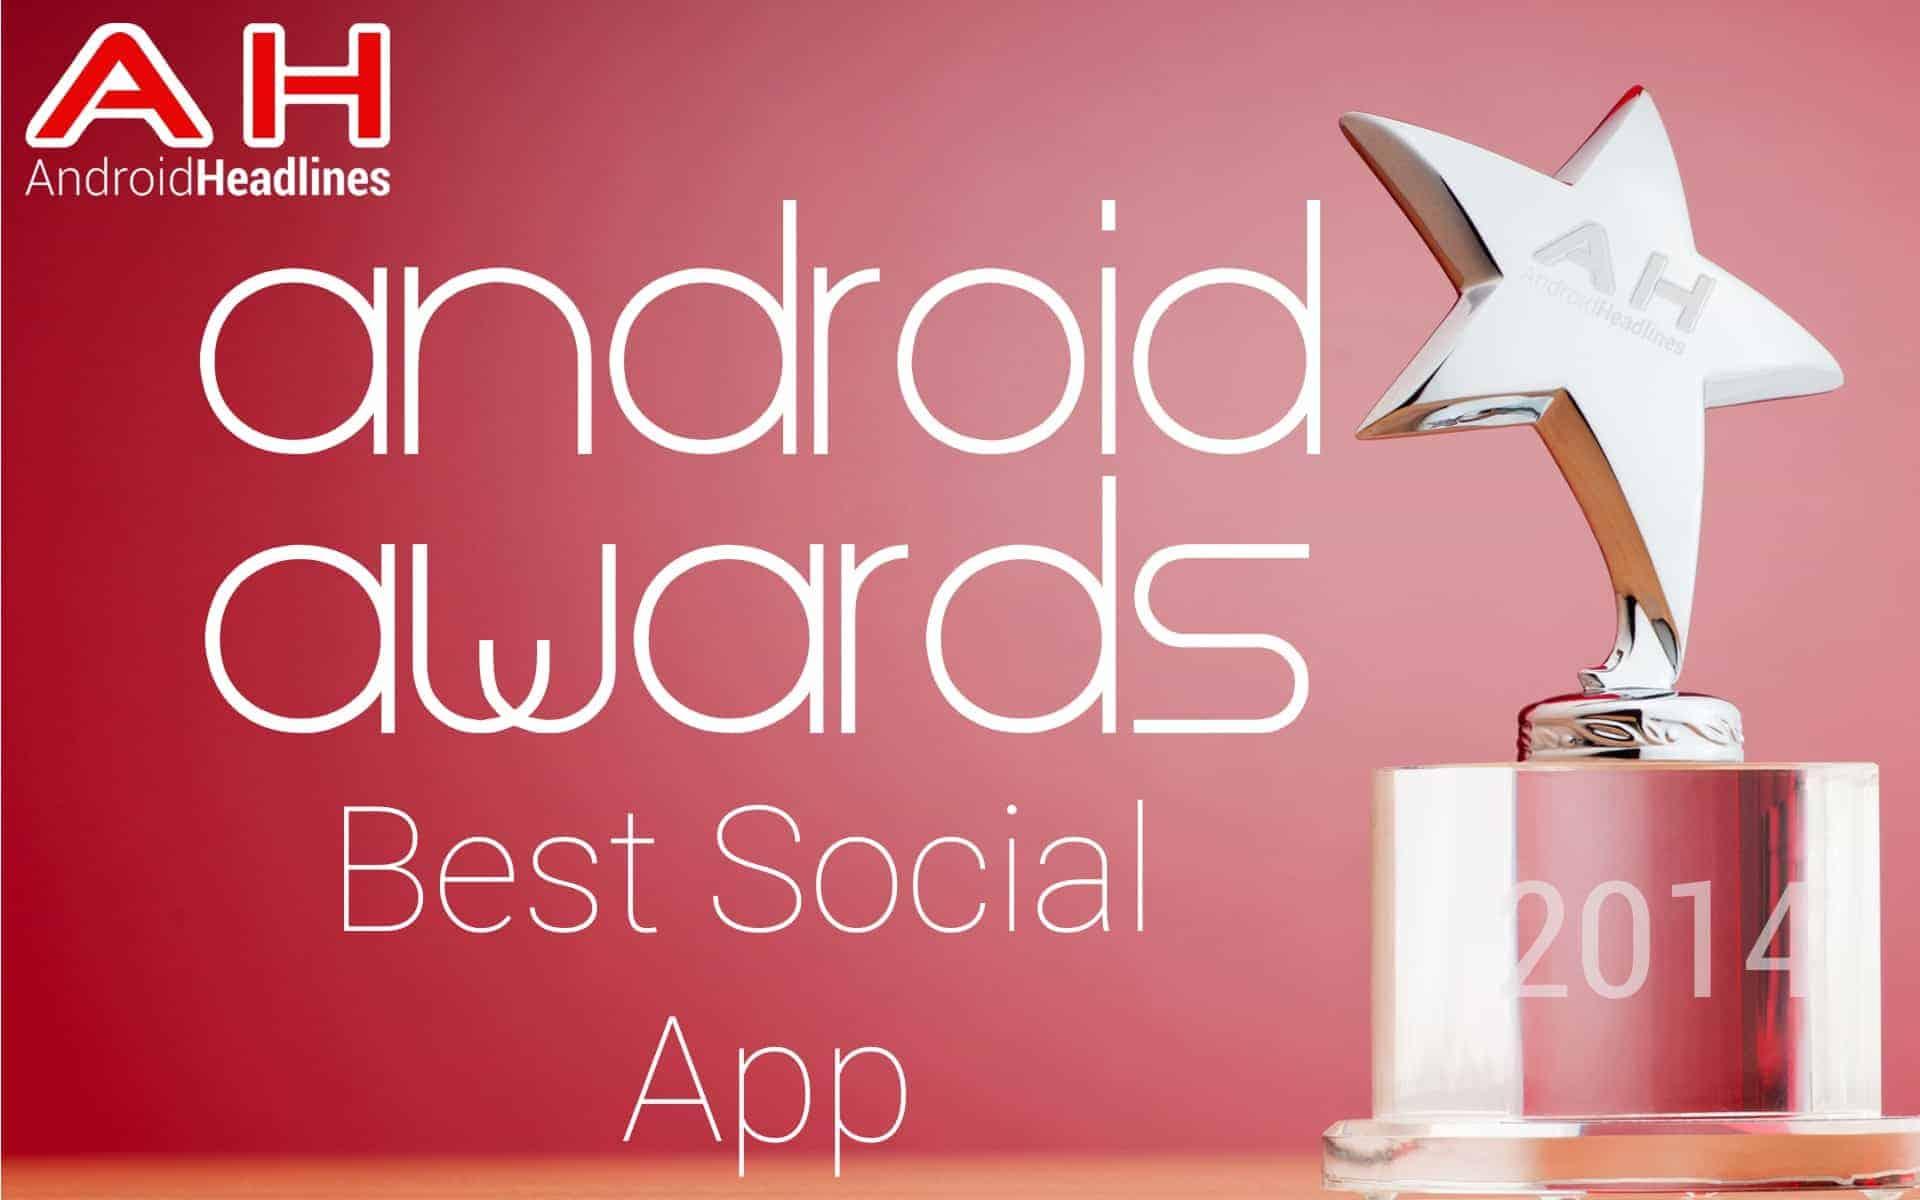 AH Awards 2015 Best Android Social App